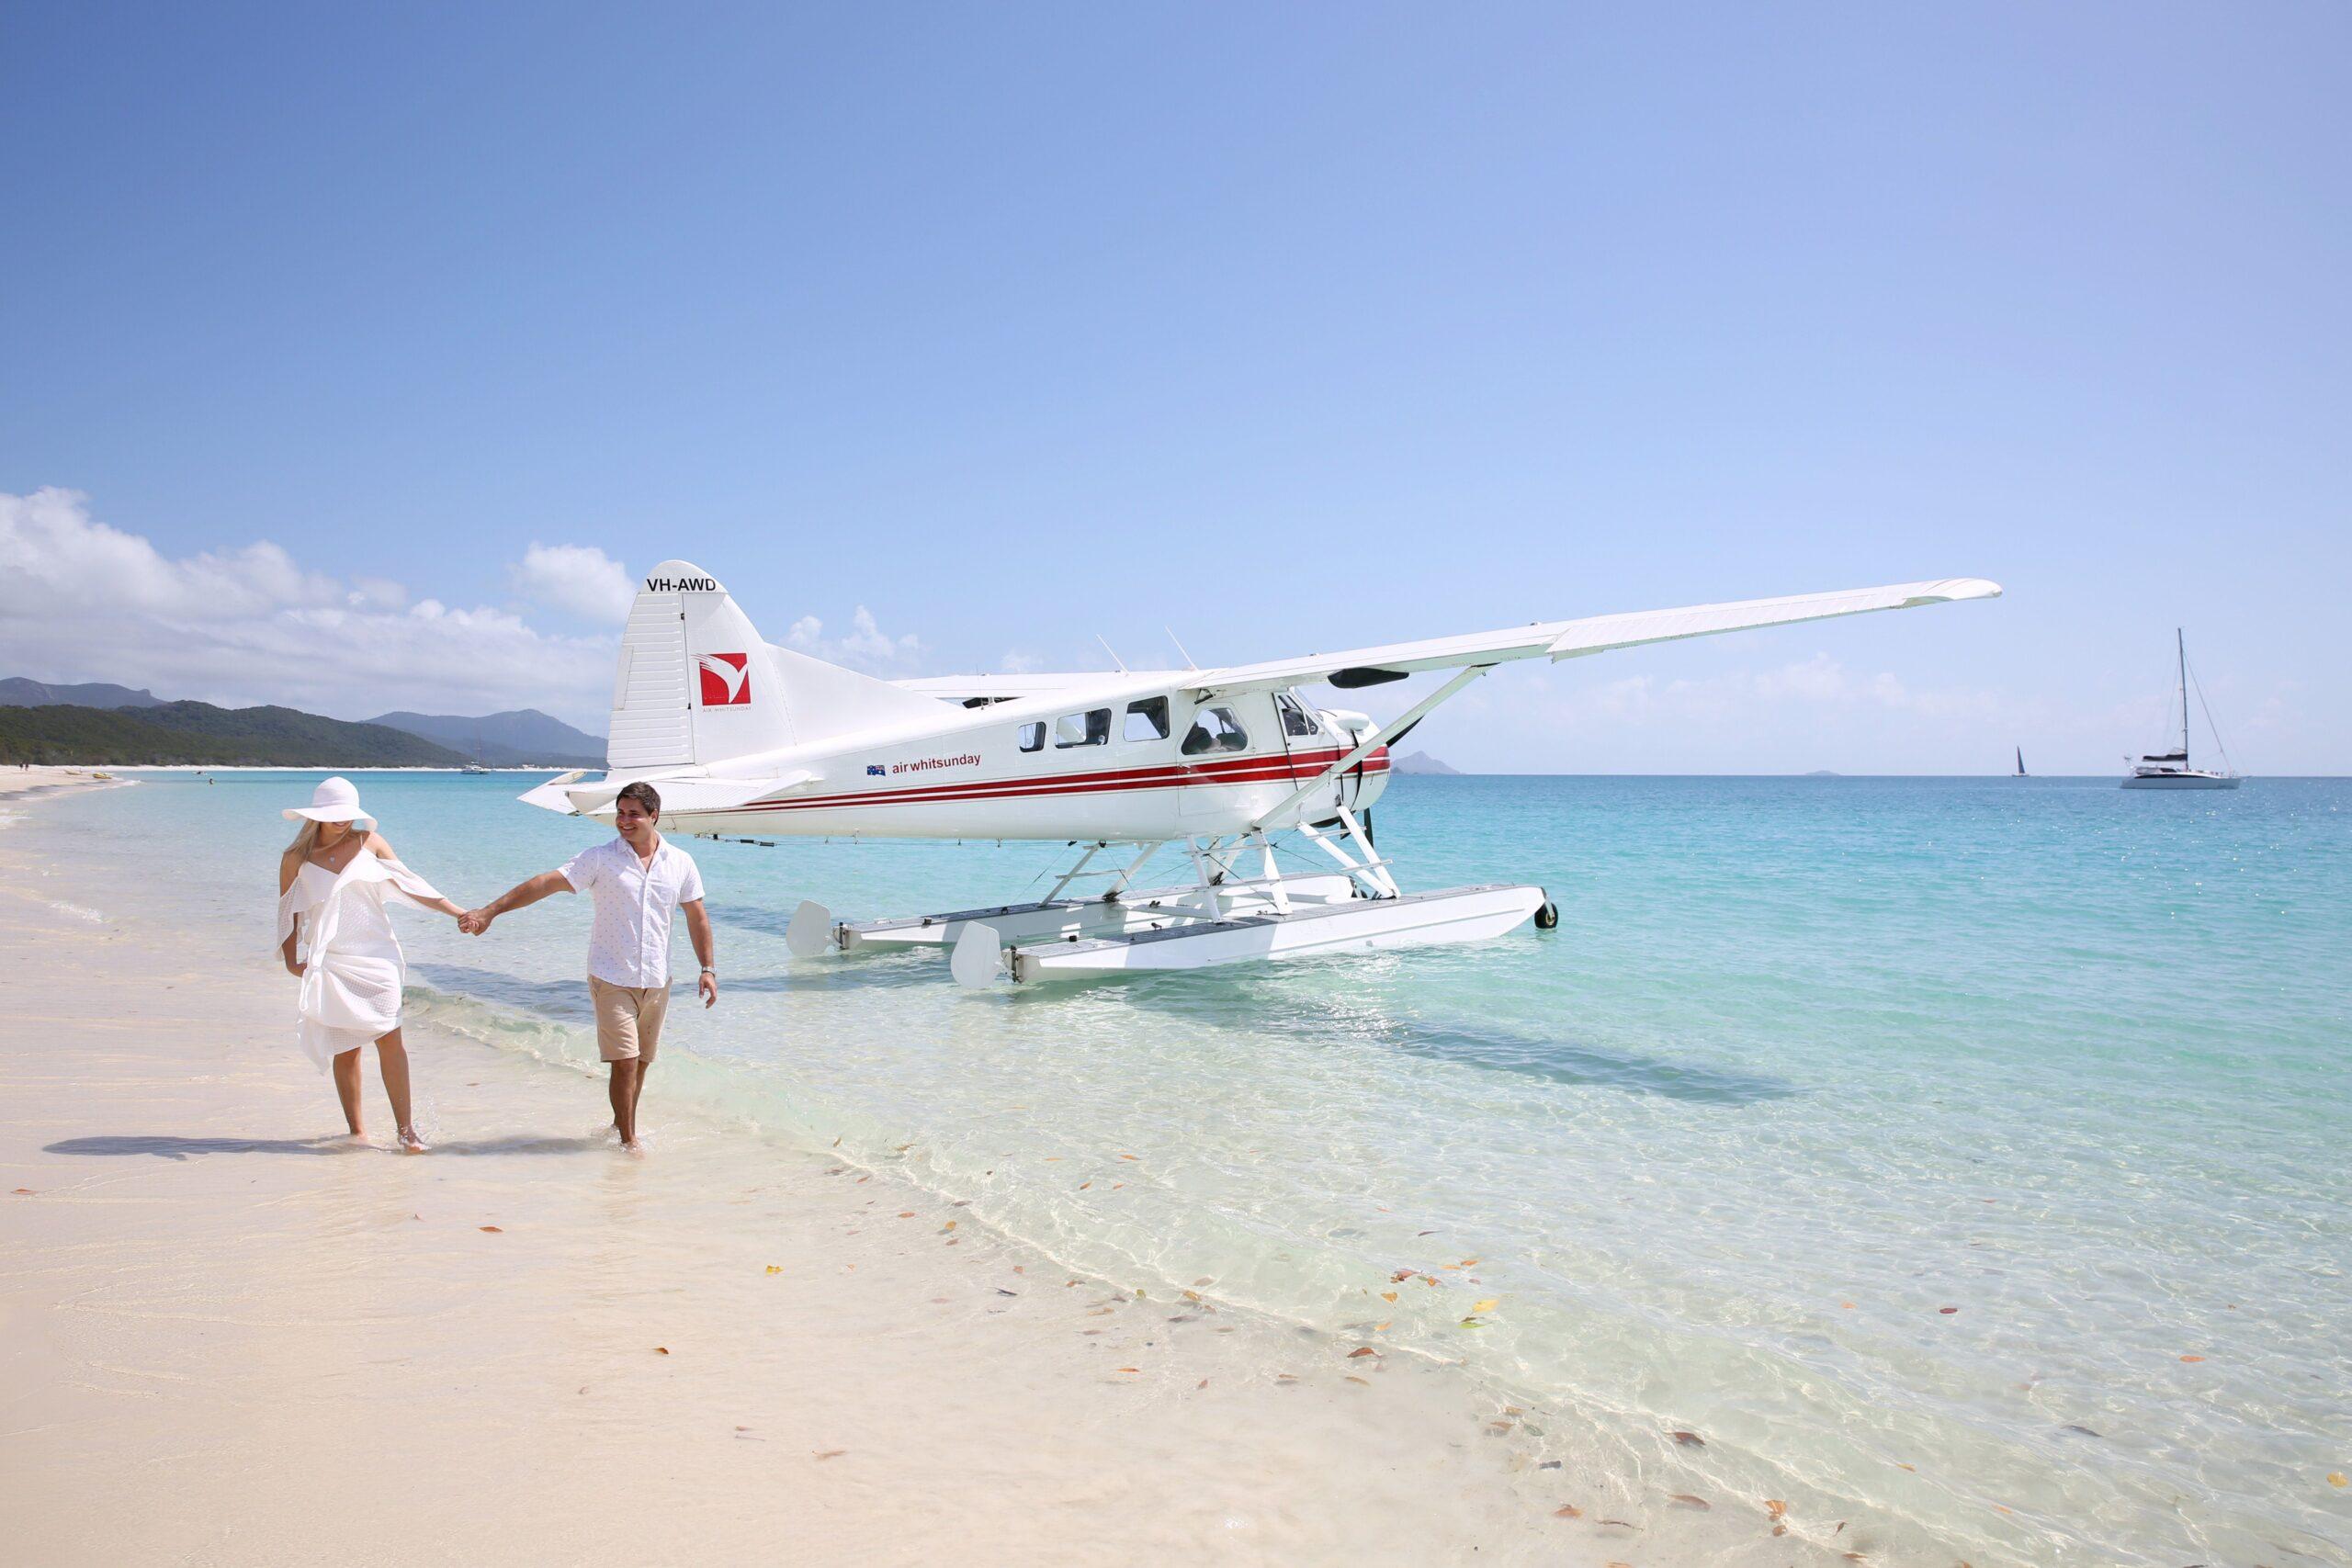 YOTSPACE superyacht voyages - Great Barrier Reef - Optional Seaplane Flights